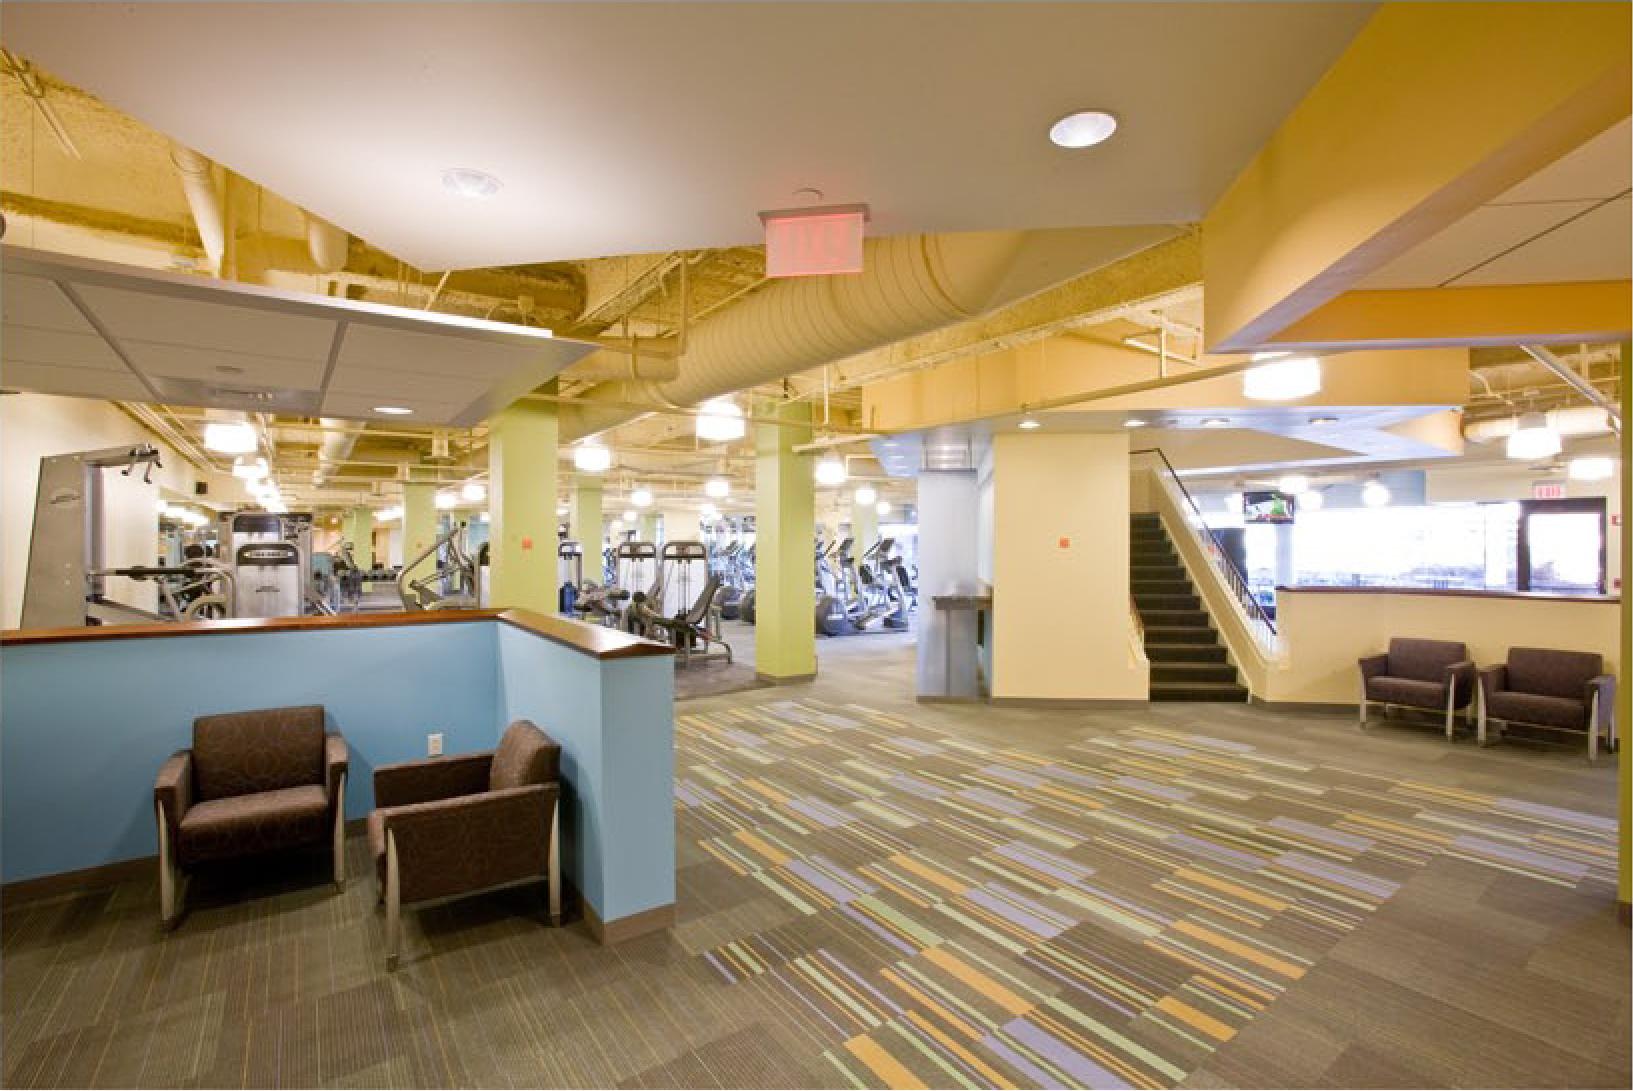 Fitness Center Construction : Fitness center construction shire pharmaceutical horst